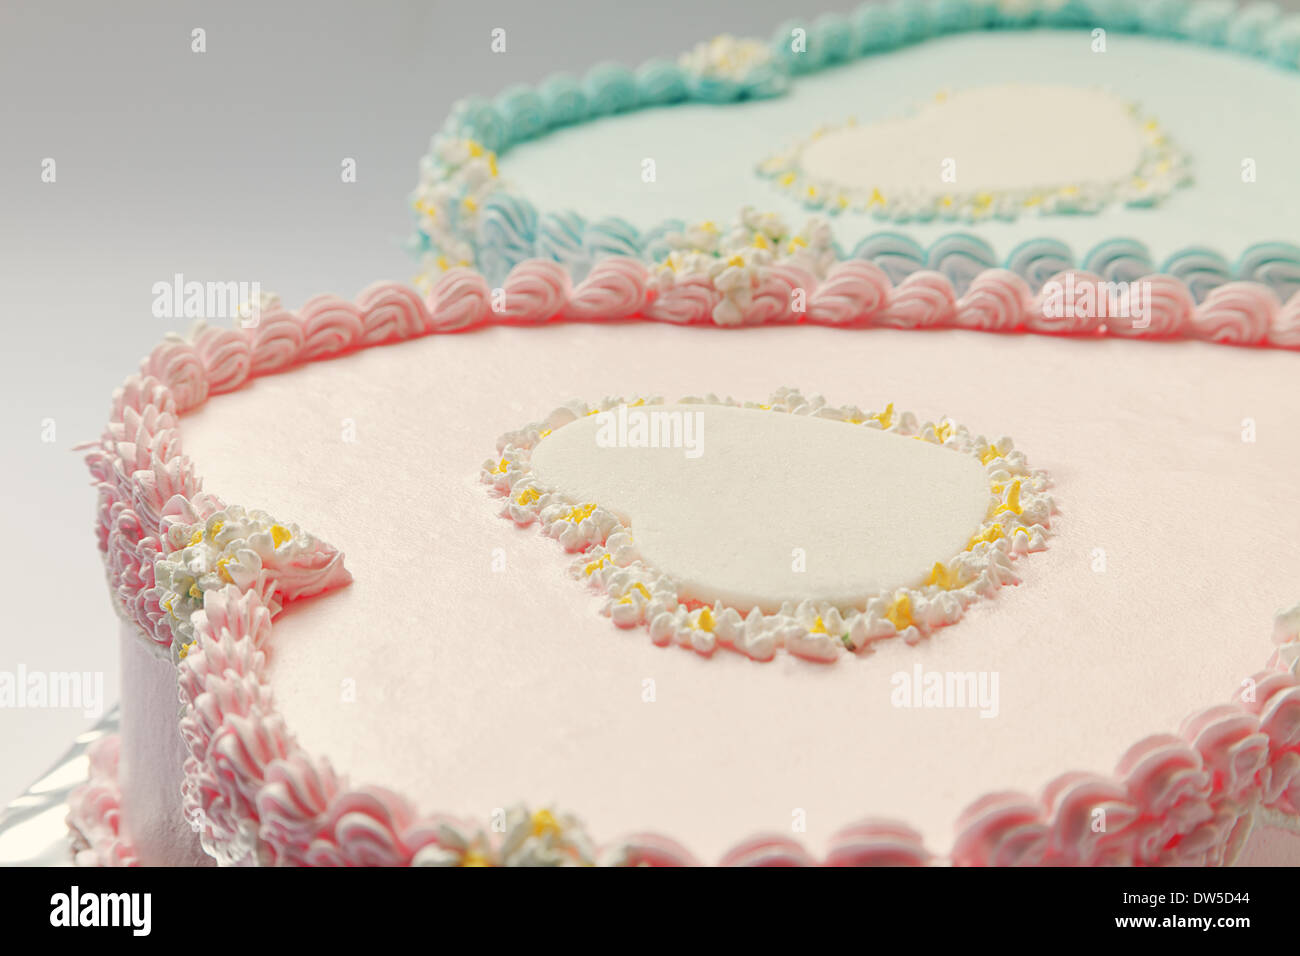 Swell Birthday Cakes Twins Boy Girl Stock Photos Birthday Cakes Twins Funny Birthday Cards Online Inifodamsfinfo